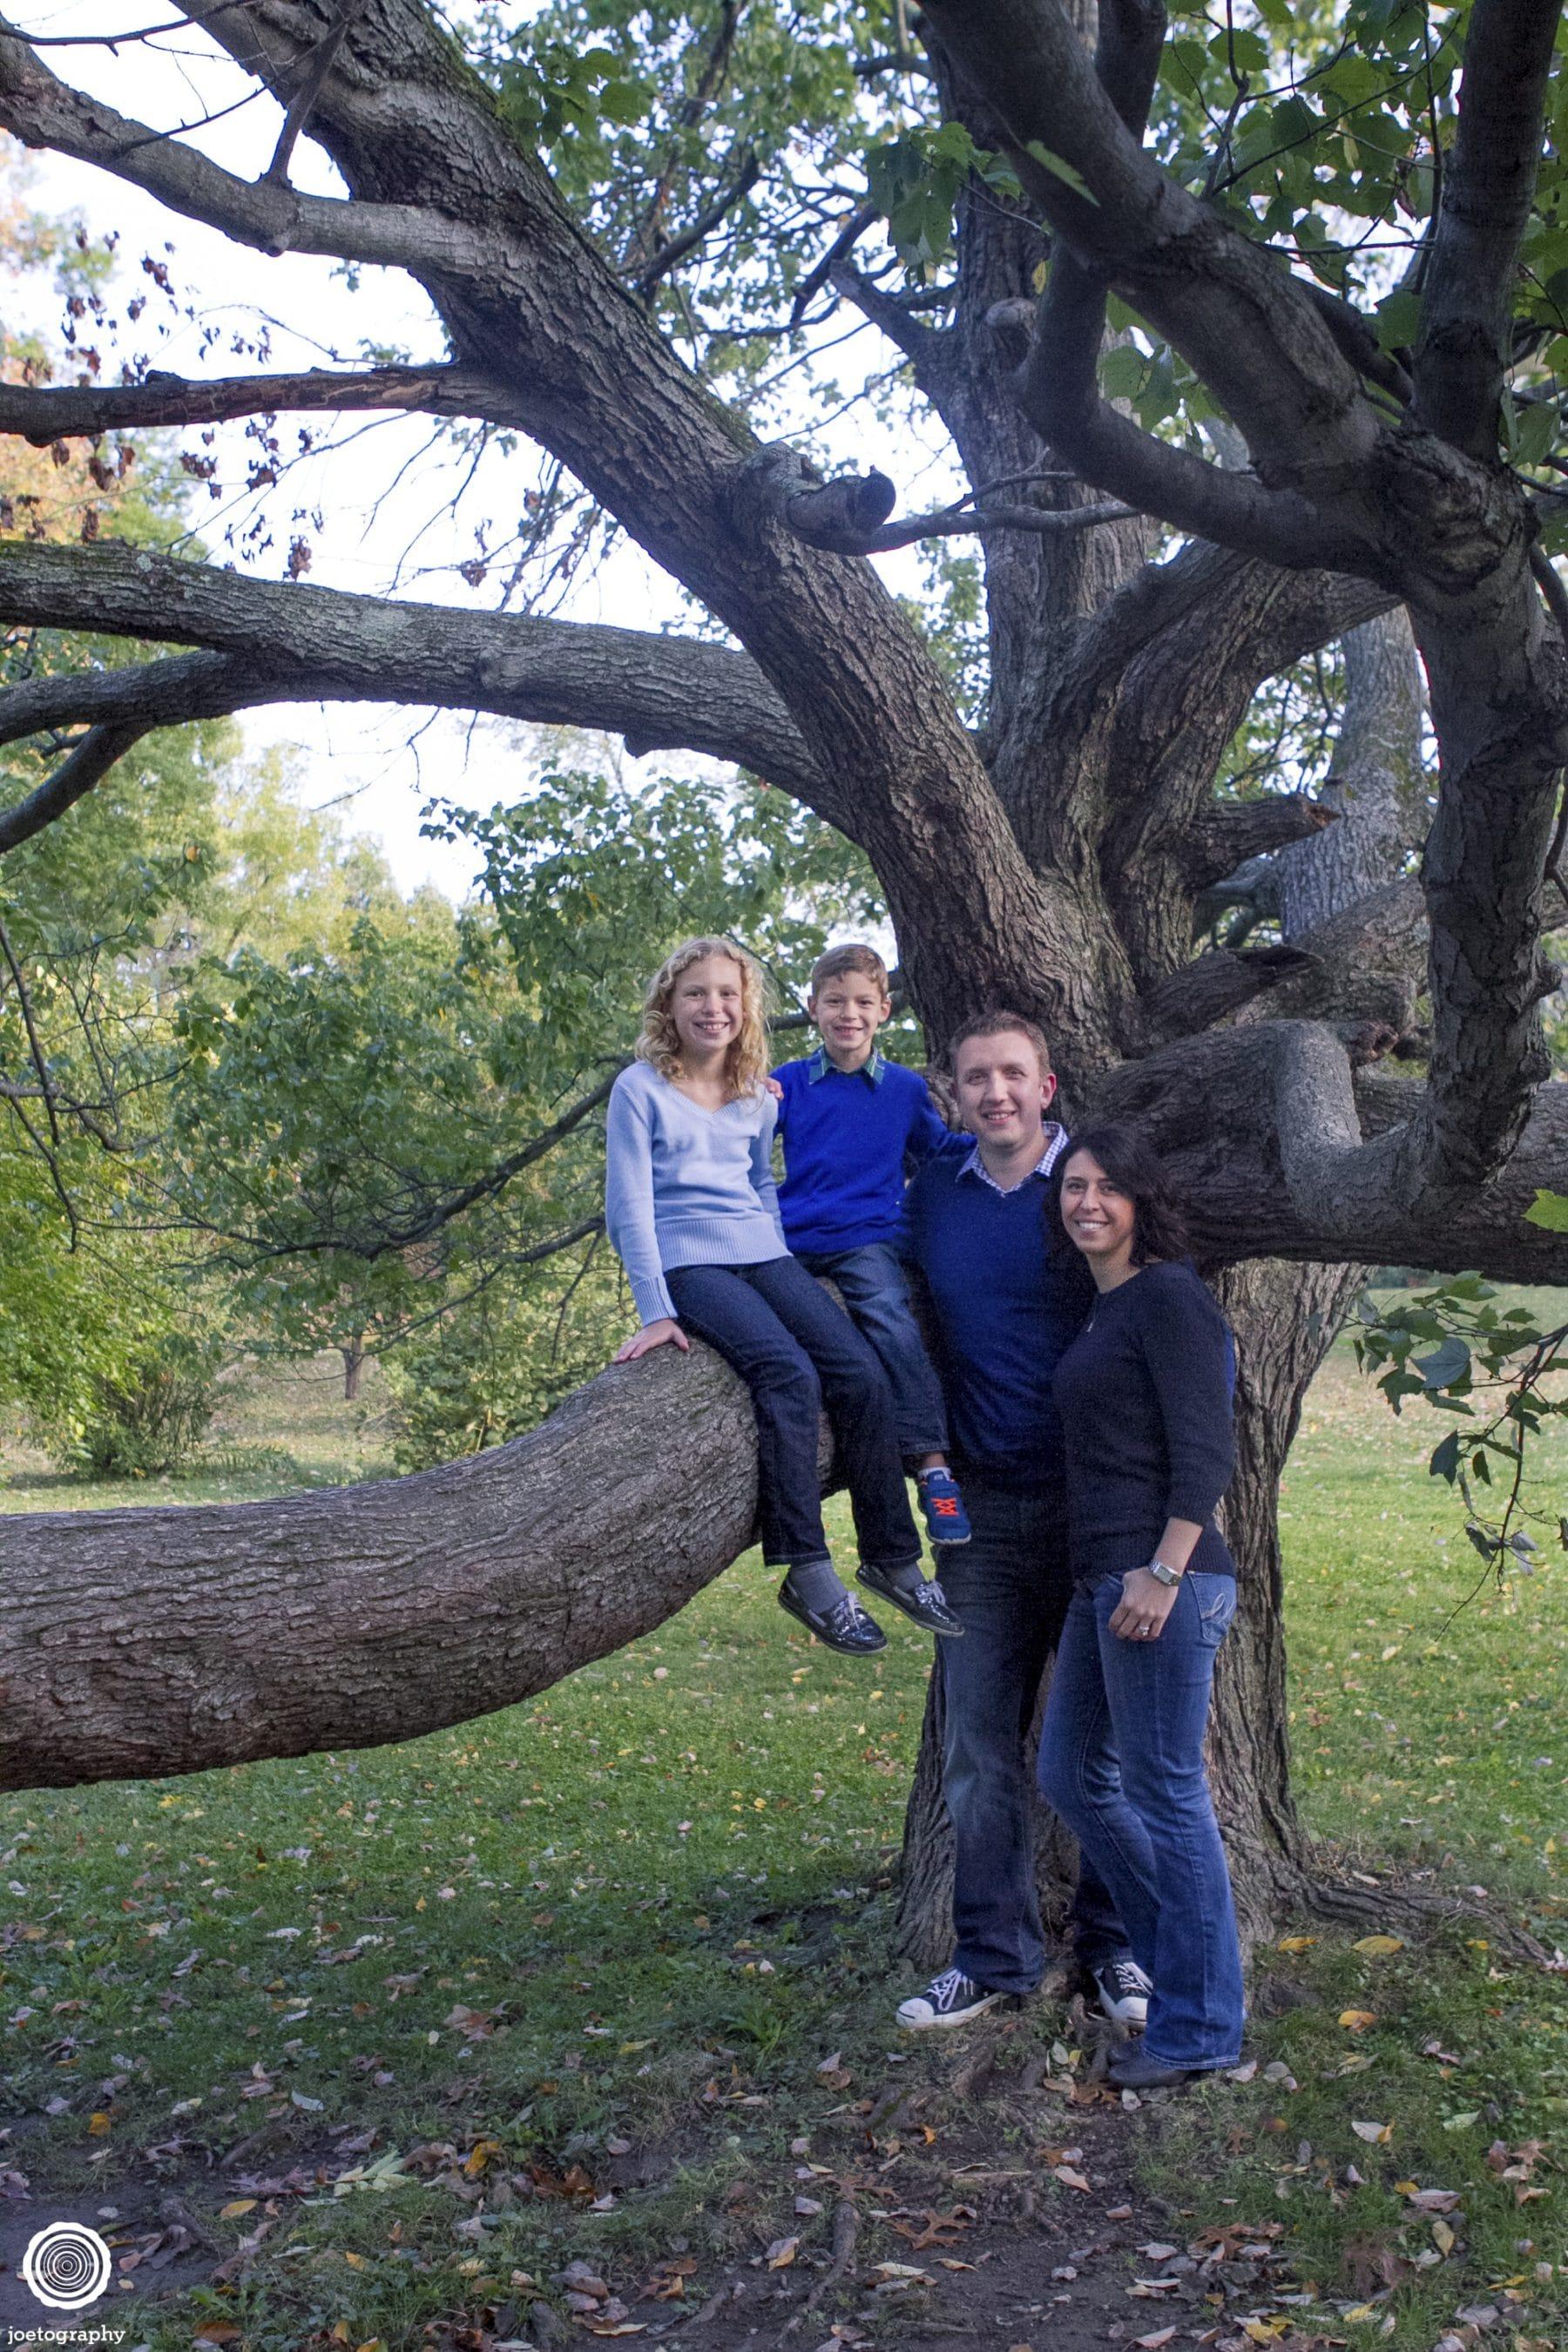 gose-family-photographs-holliday-park-indianapolis-7